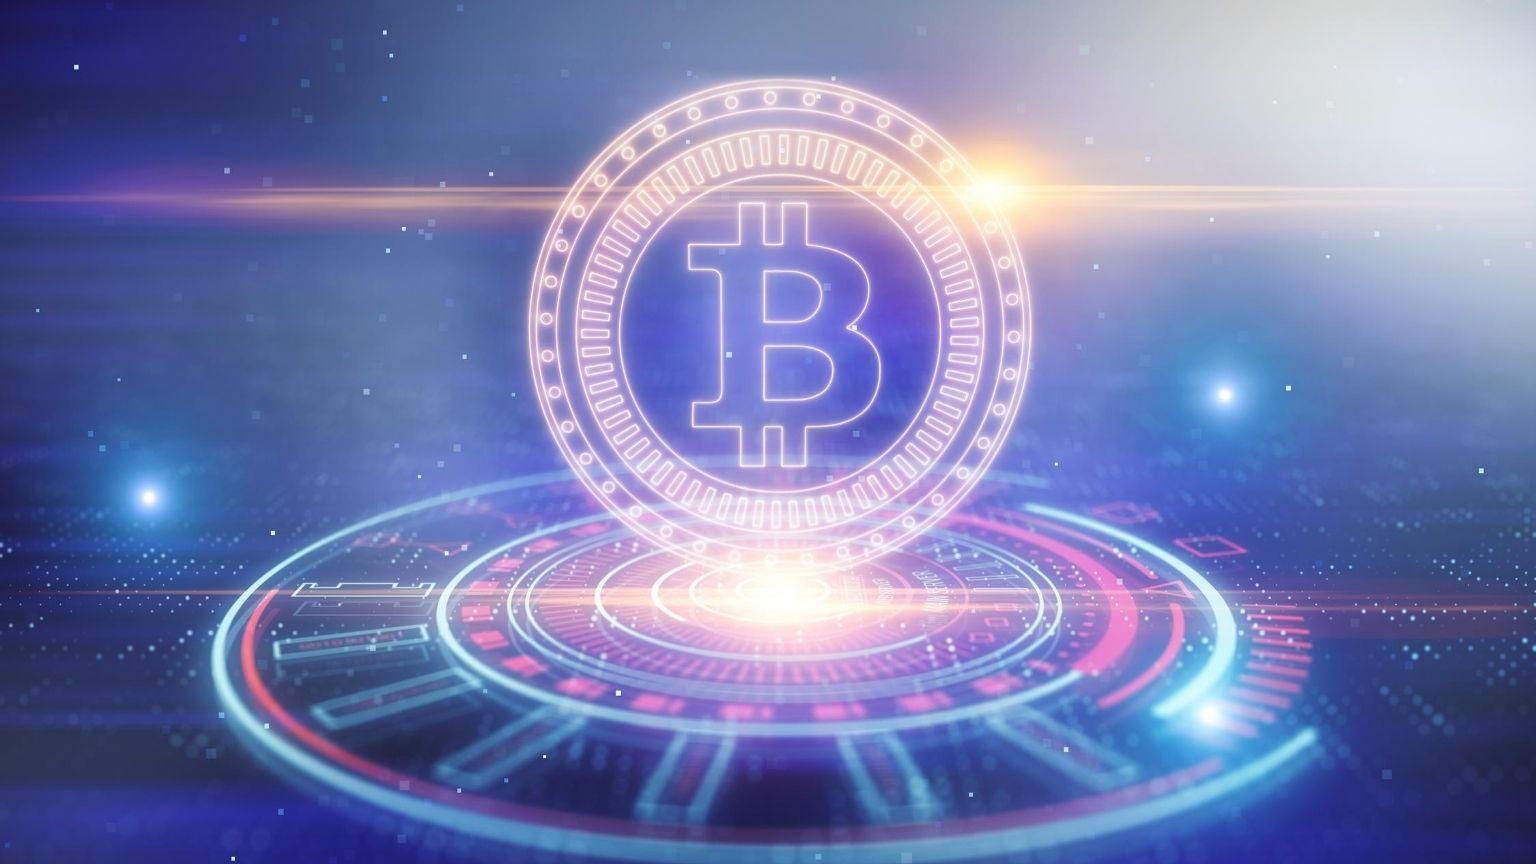 (Advanced) Mastercoin Explained. An Amazing Bitcoin 2.0 Idea!